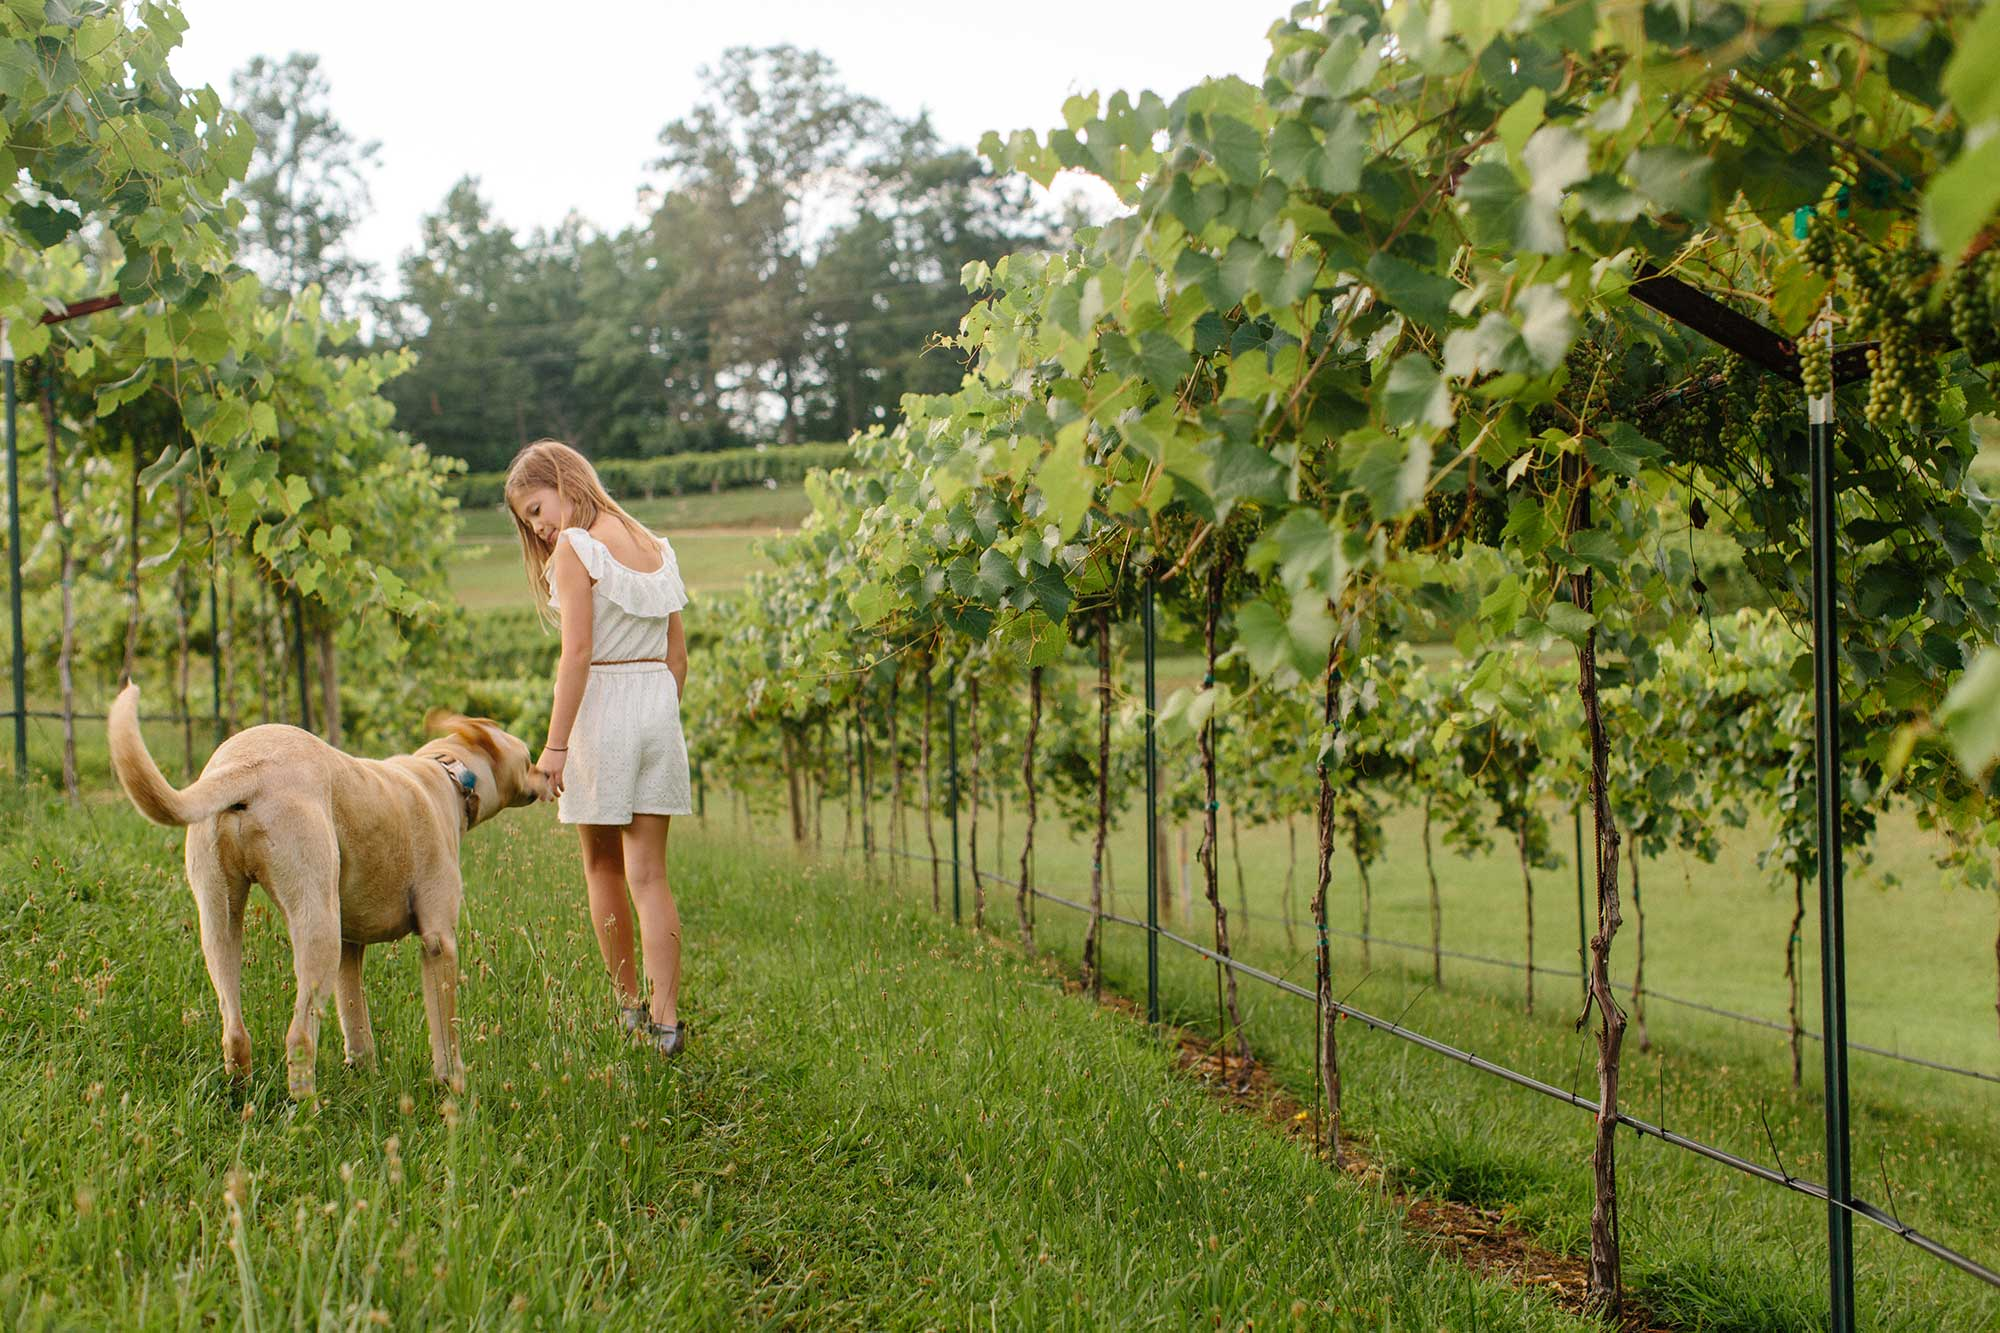 A girl and a dog walk through the vineyard